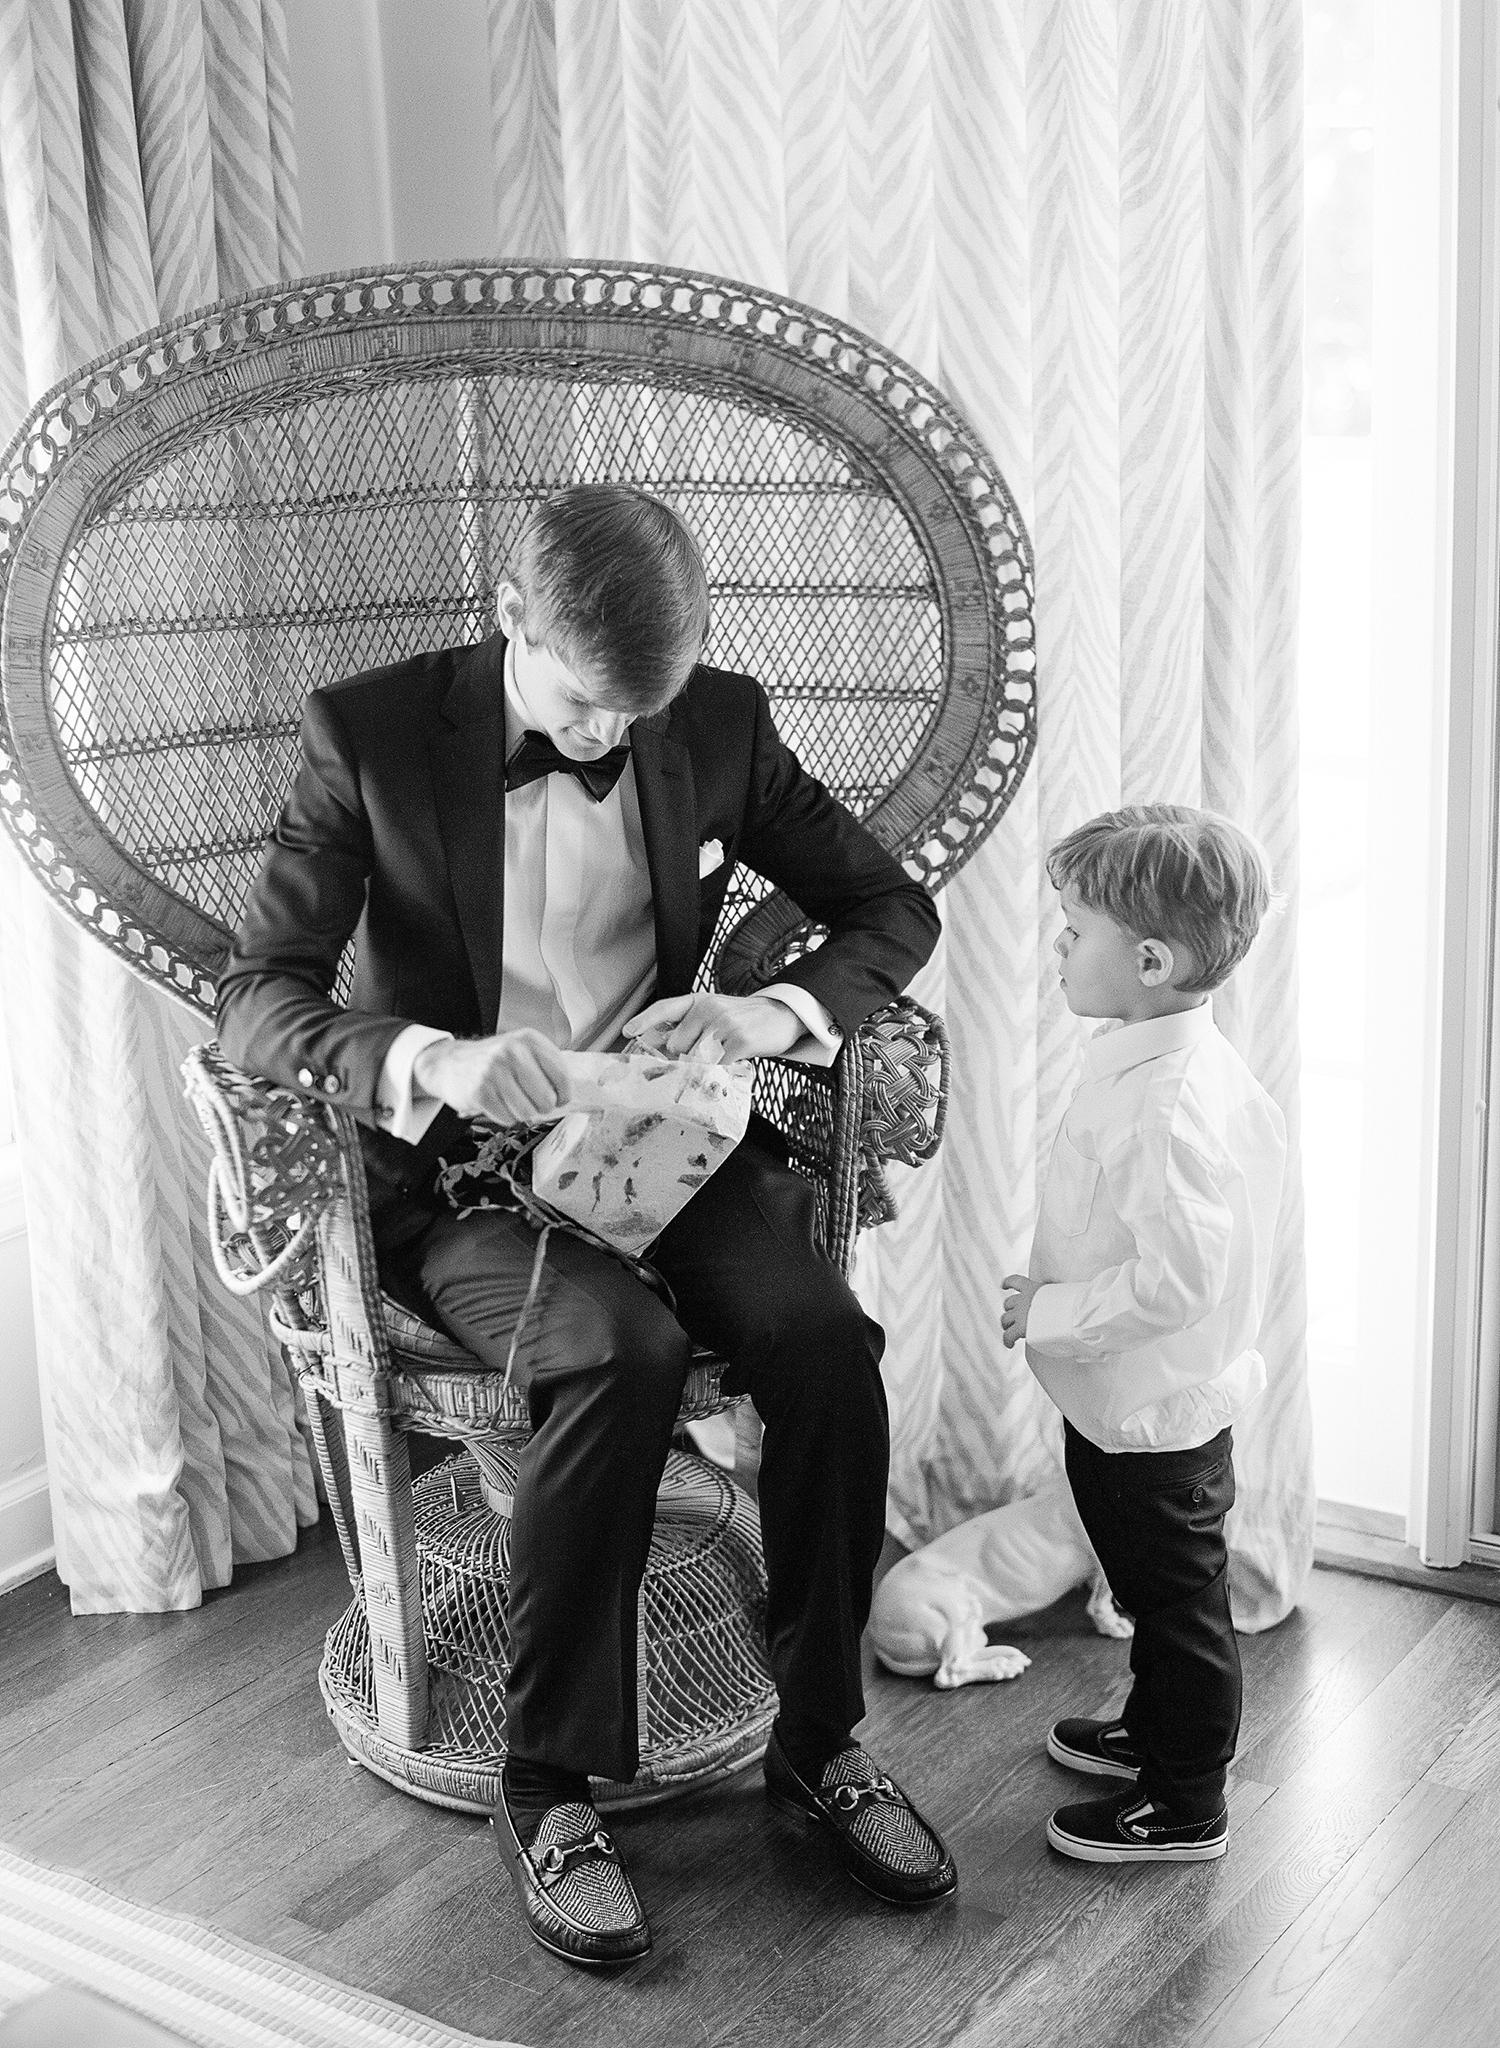 chelsea conor wedding groom getting ready gift